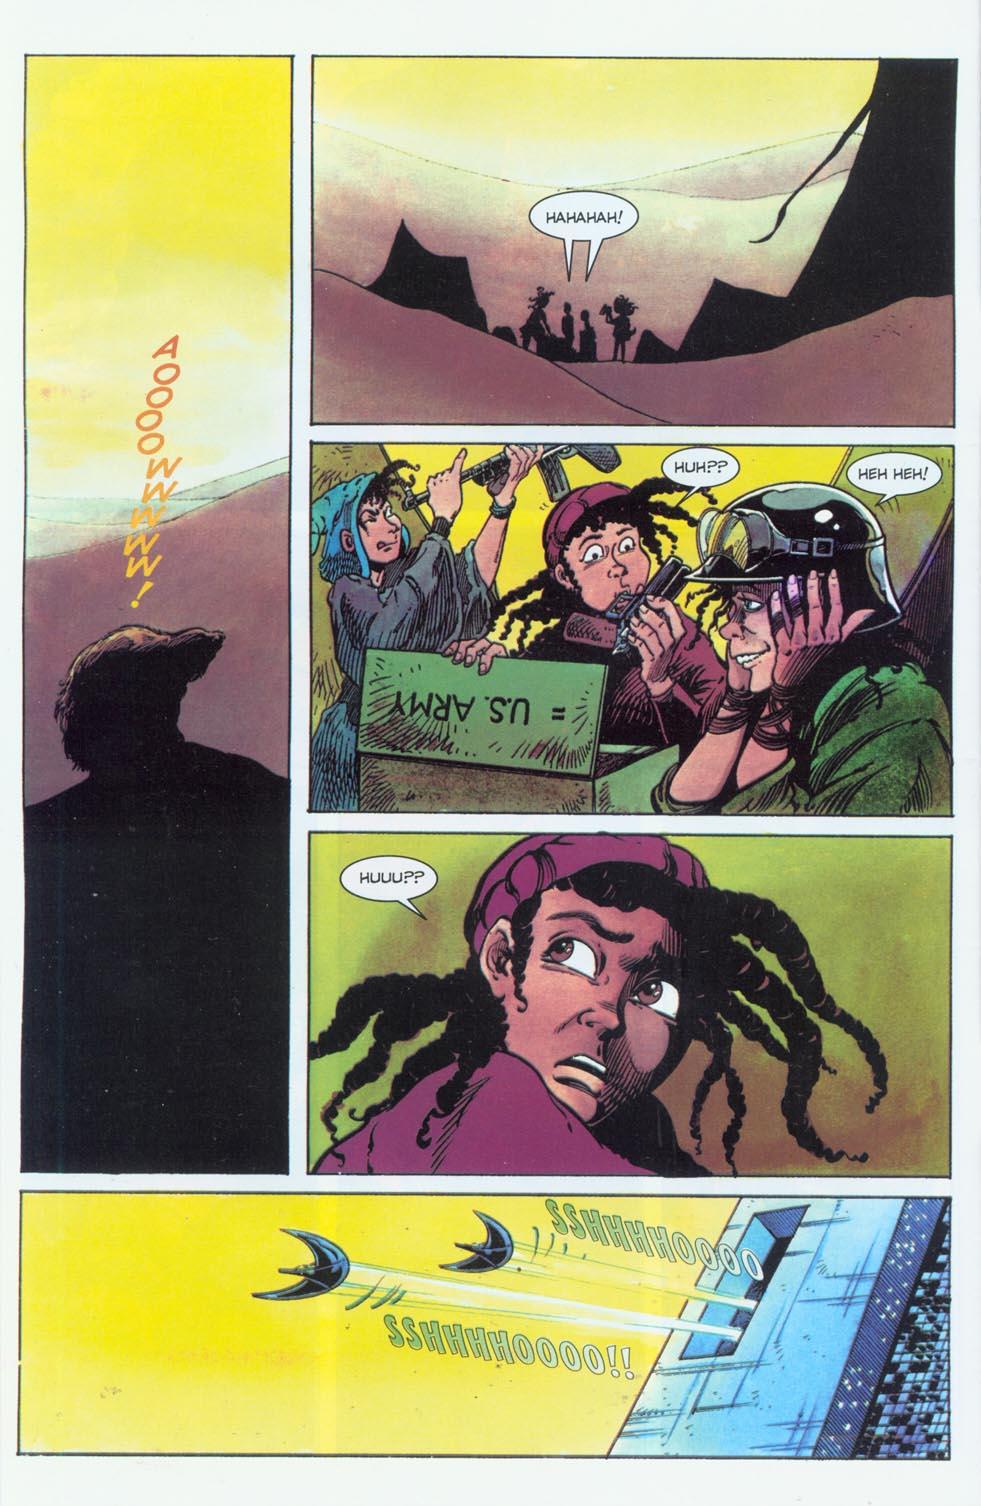 Read online Stargate comic -  Issue #3 - 8